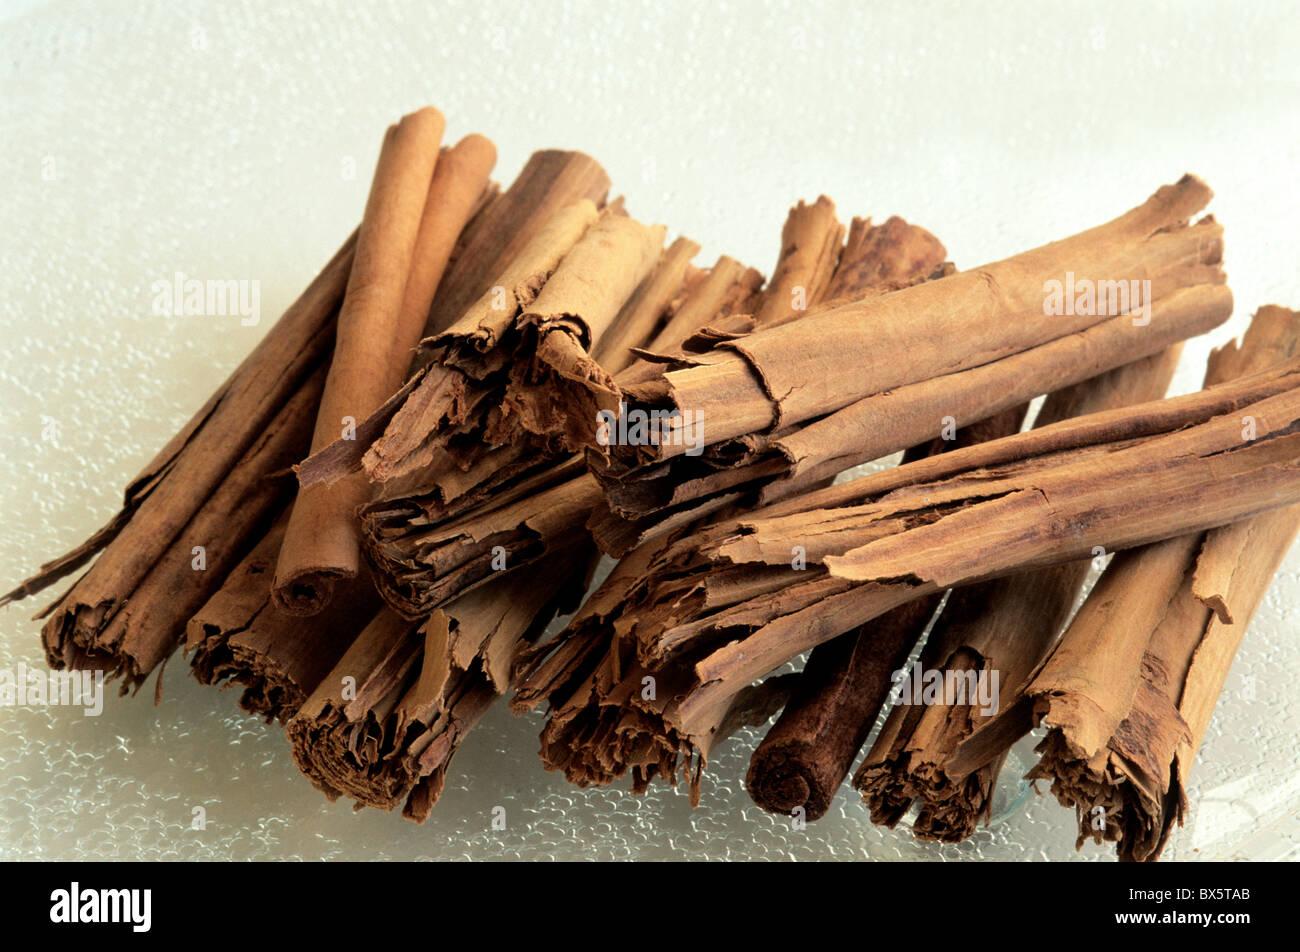 Cinnamon sticks, tray. - Stock Image